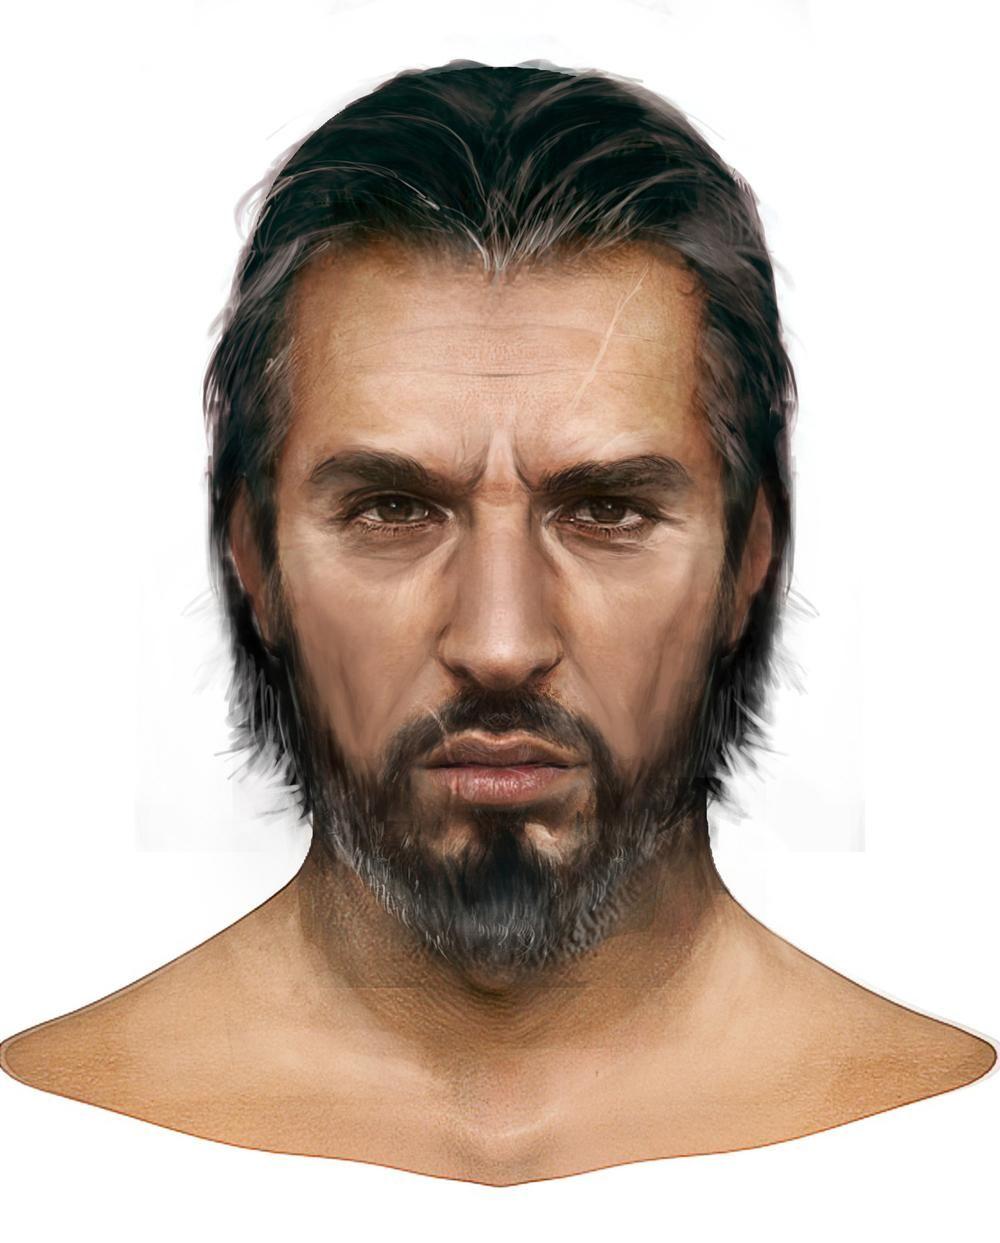 Ezio Auditore Da Firenze Gallery Assassin S Creed Embers